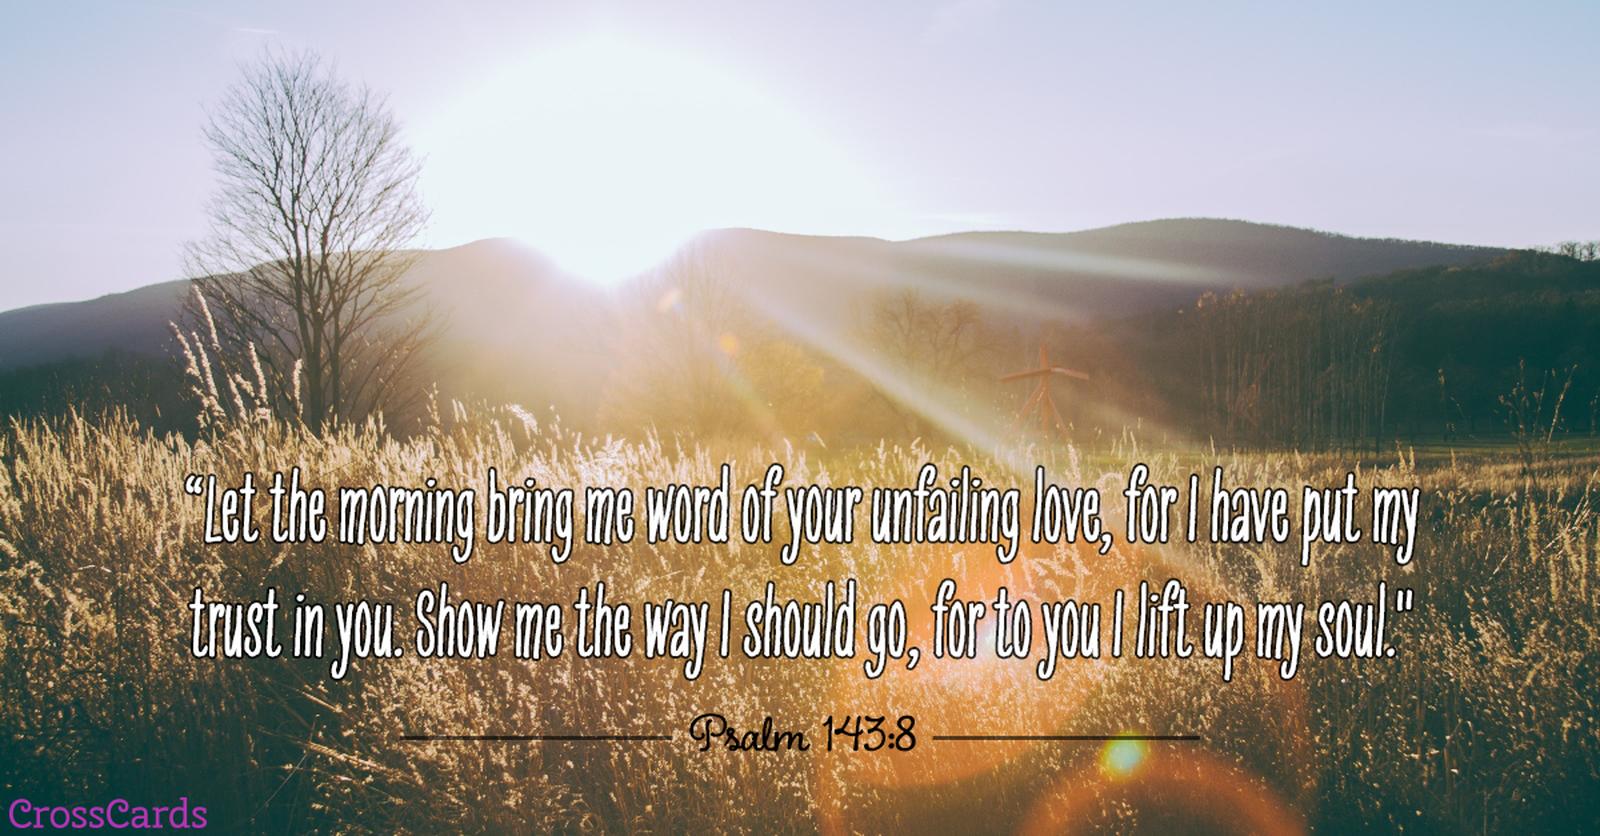 Psalm 143:8 - Your Unfailing Love ecard, online card